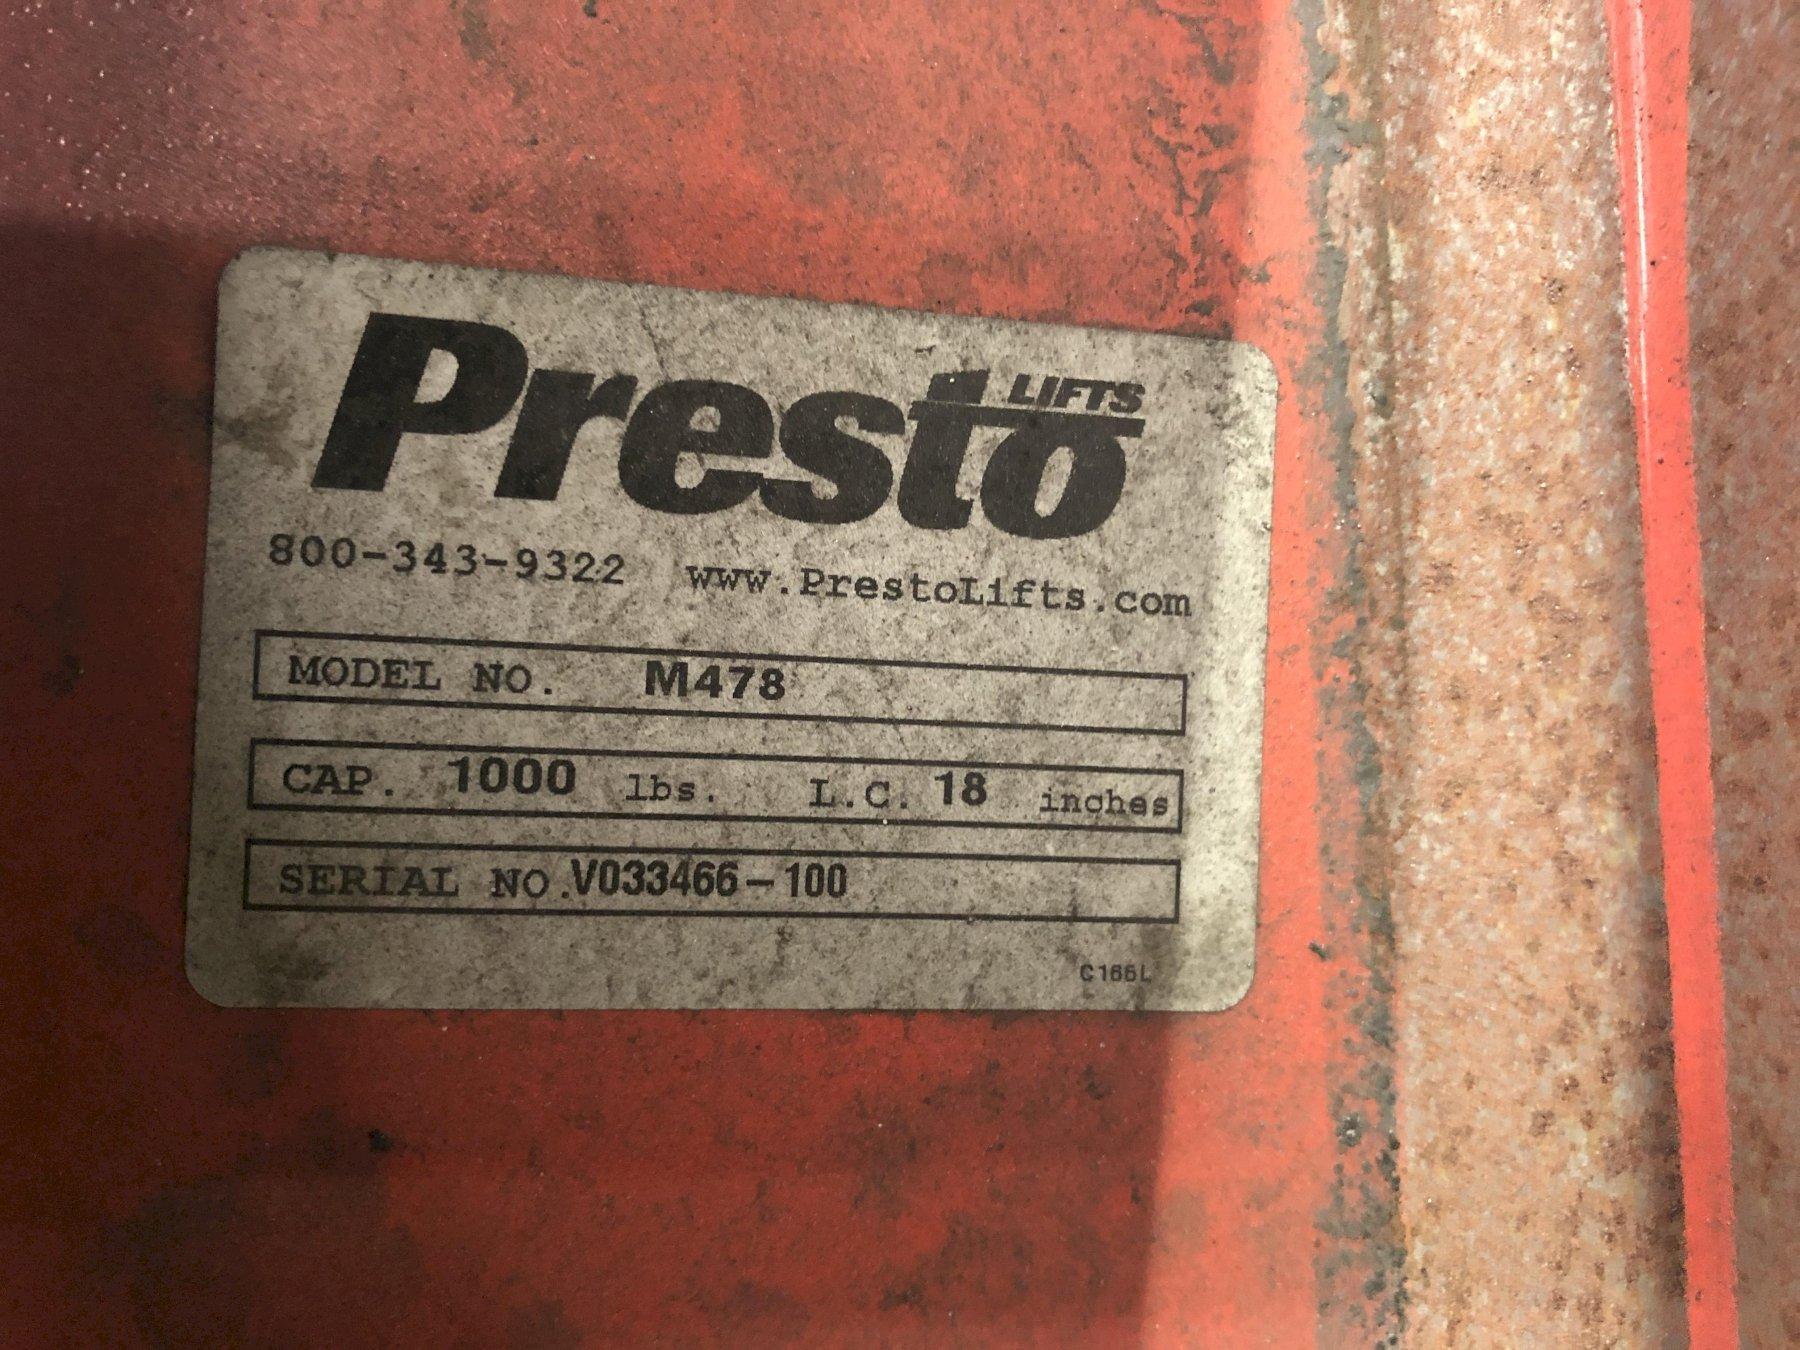 PRESTO HAND LIFT CART MODEL M478 S/N V033466-100 1000# CAPACITY